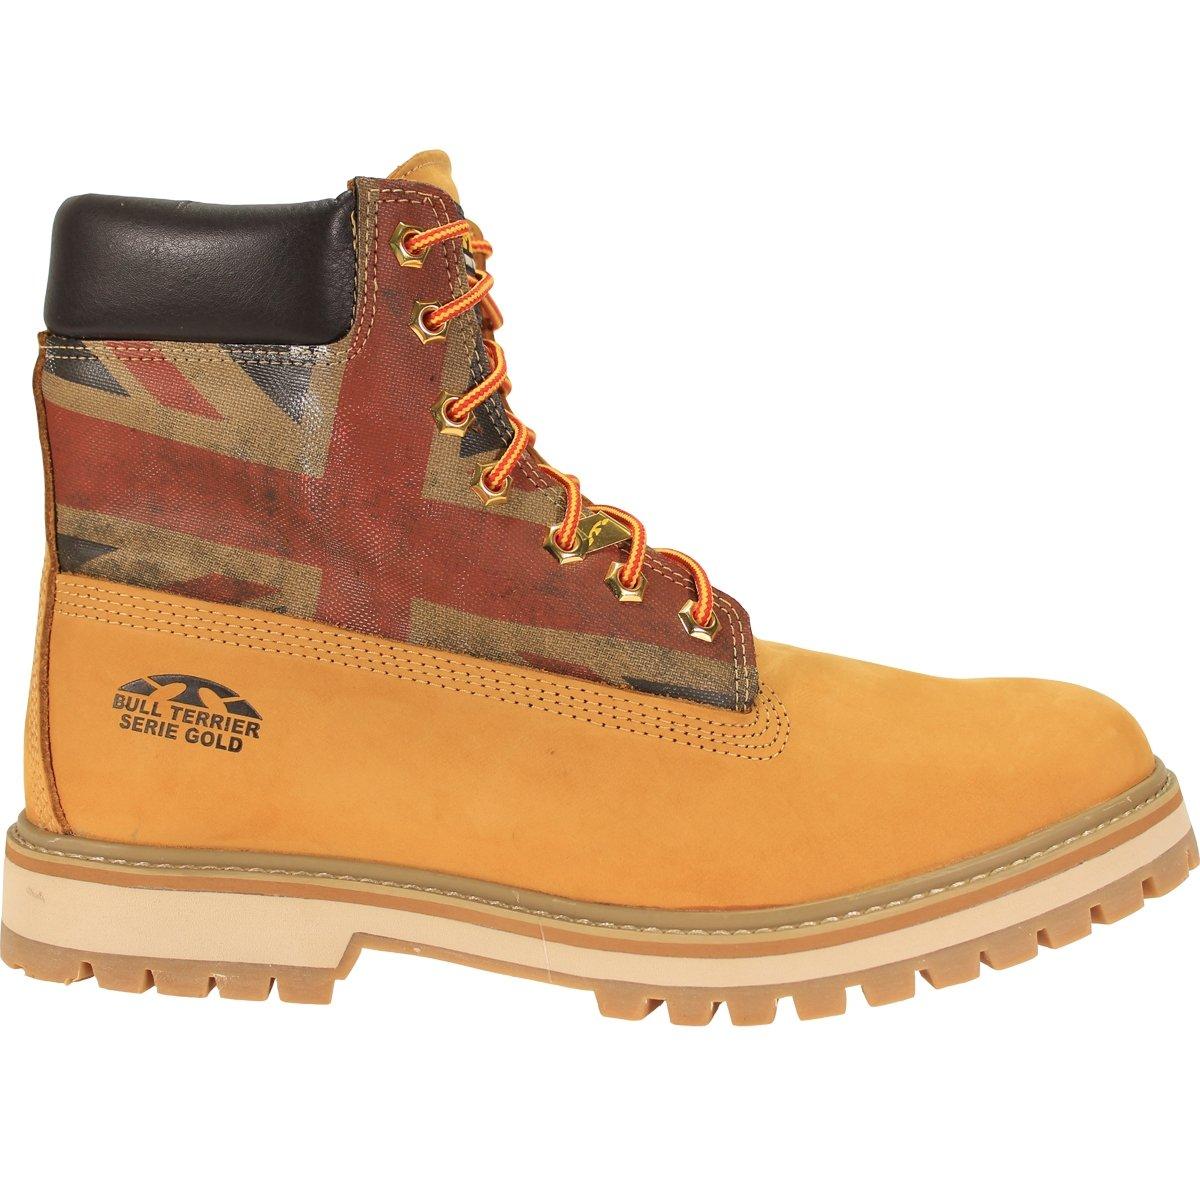 Bota Bull Terrier Mack Flag - Compre Agora   Netshoes c22d74507e